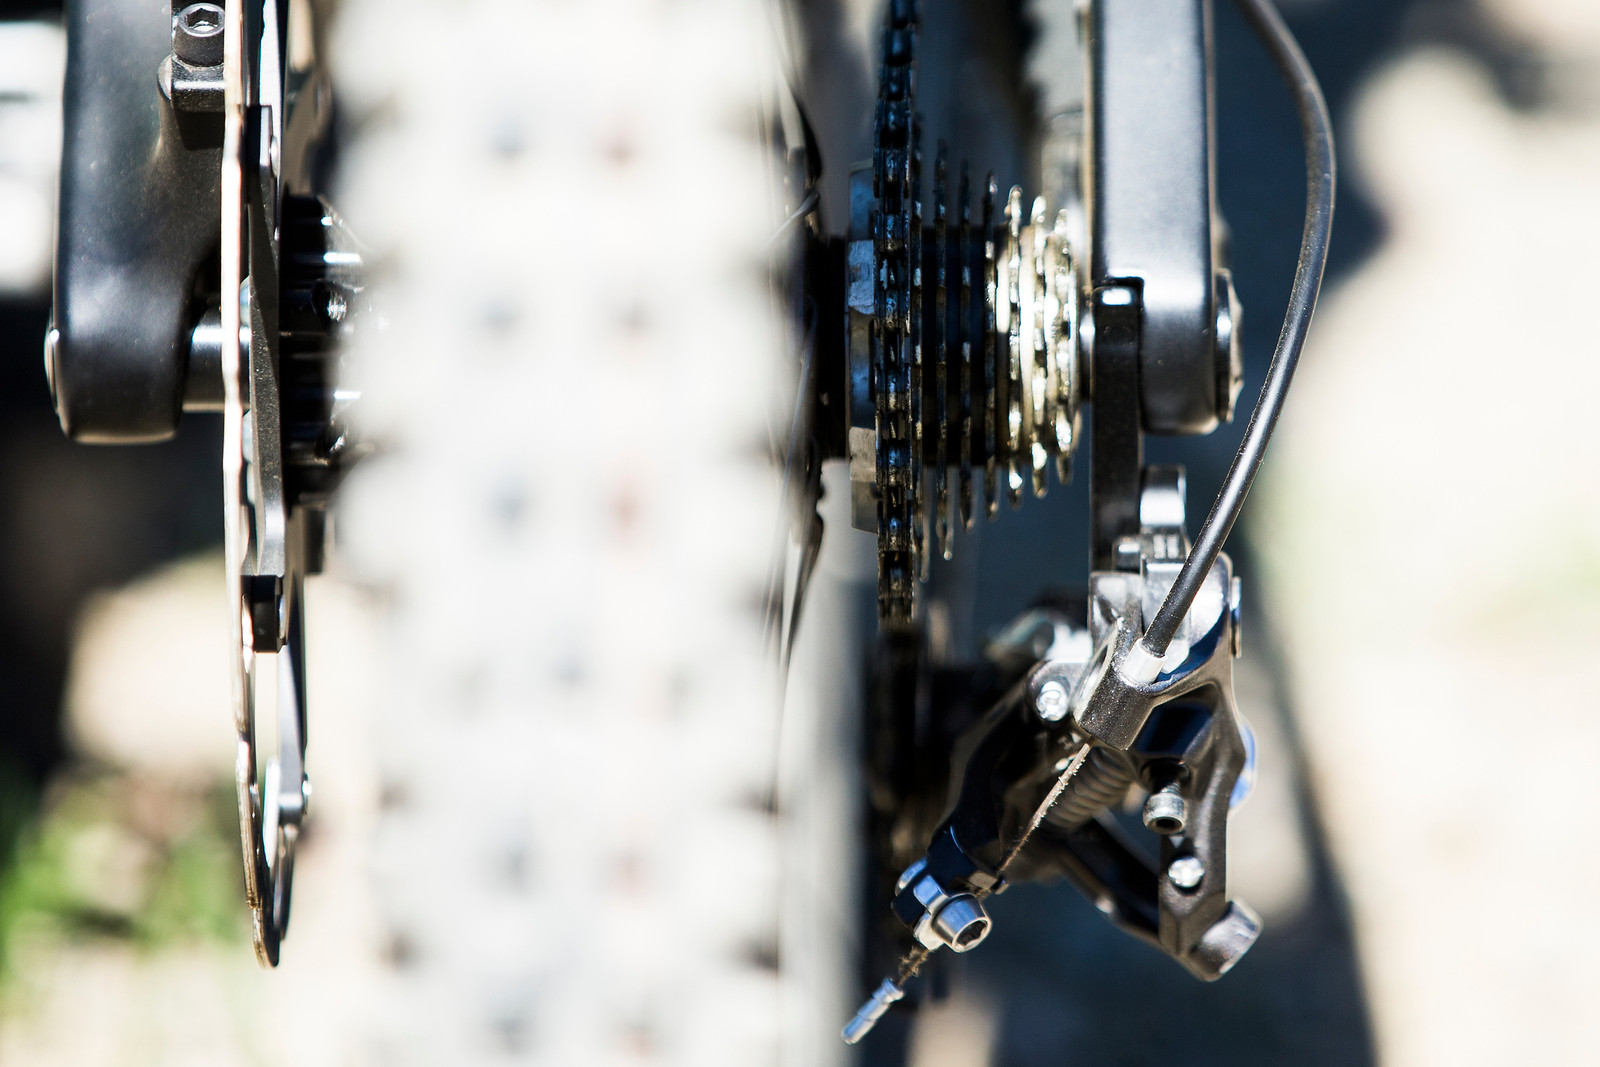 Shimano Cassette Cluster - WINNING BIKE: Tahnee Seagrave's Prototype Transition - Mountain Biking Pictures - Vital MTB